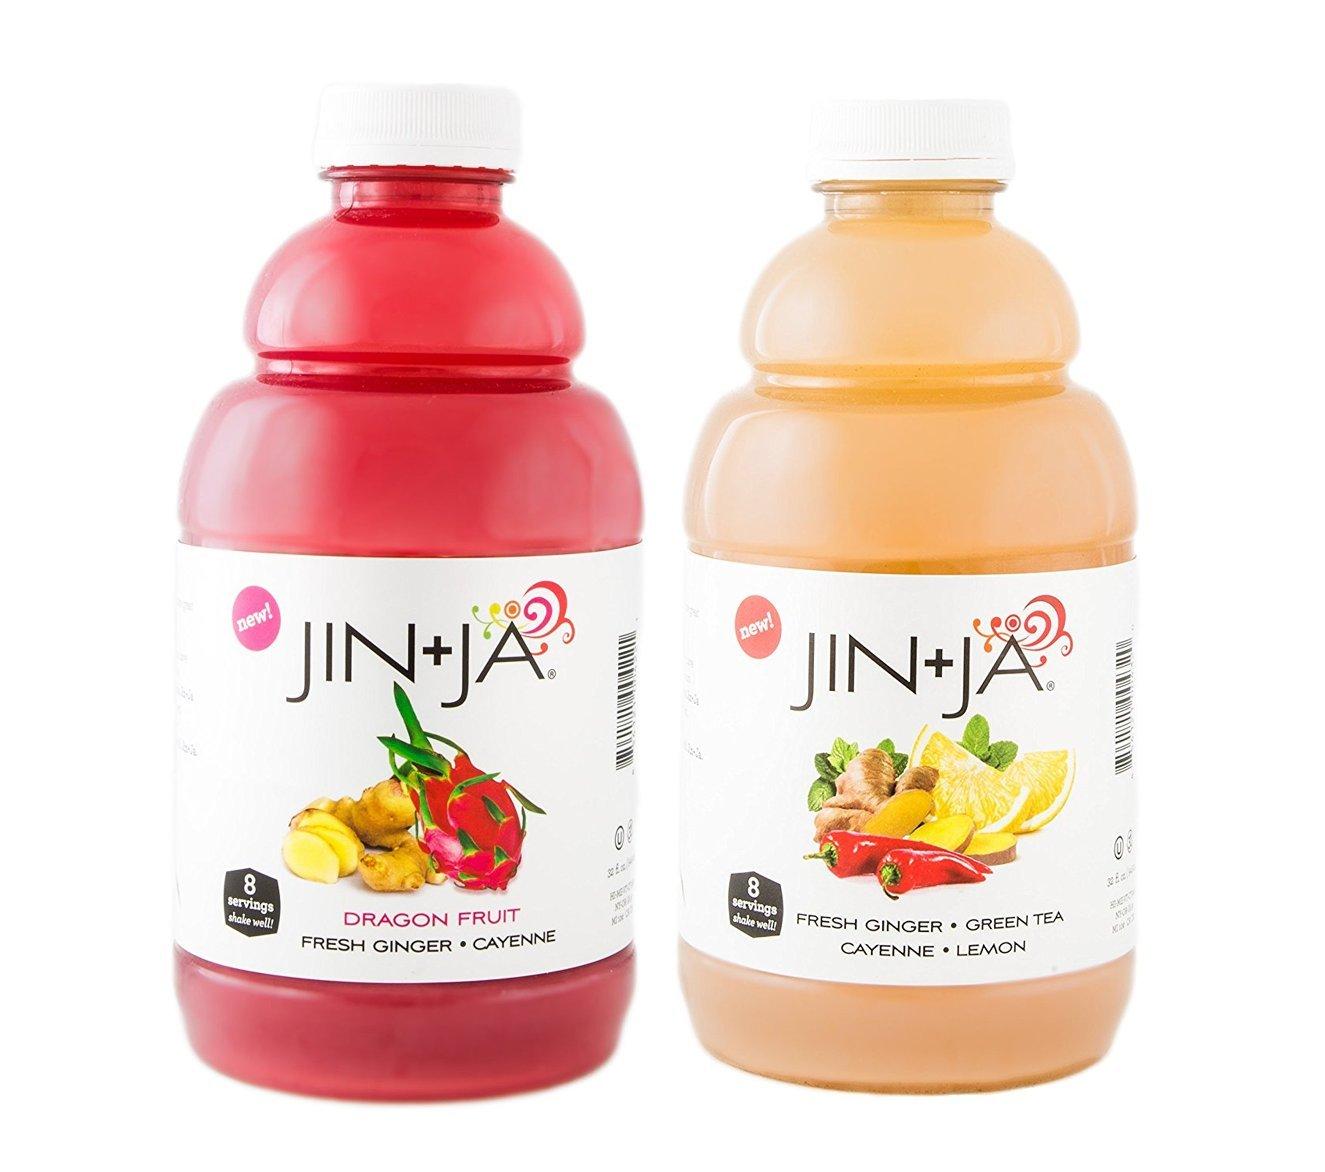 Jin-Ja Dragon Fruit and Original Flavor 6 Each, Fresh Ginger Green Tea Health Drink - 32 oz, Mixed 12 Pack